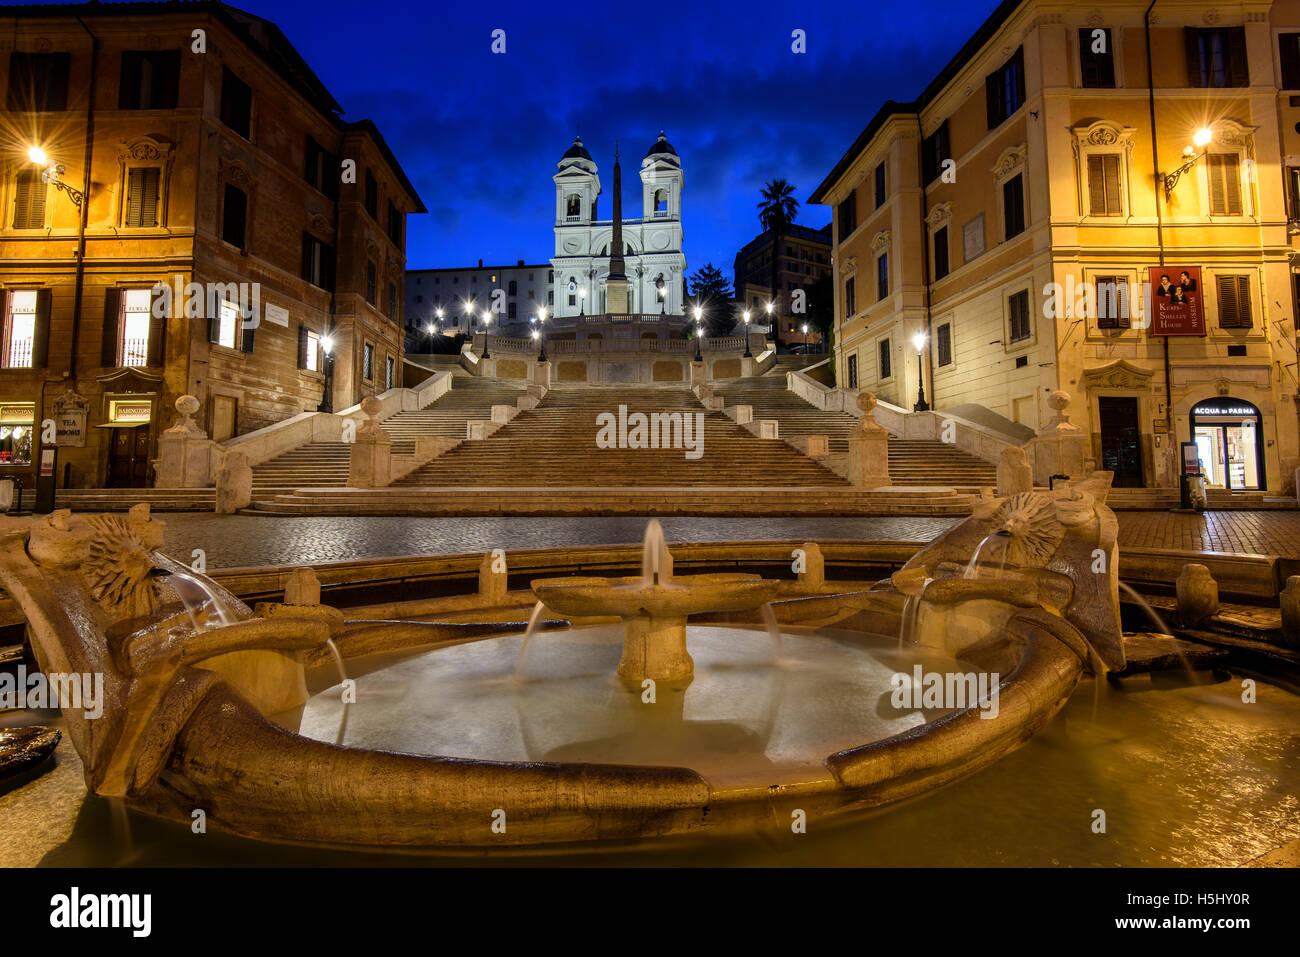 Vista de noche de Fontana della Barcaccia y la Escalinata Española, Piazza di Spagna, Roma, Lazio, Italia Imagen De Stock